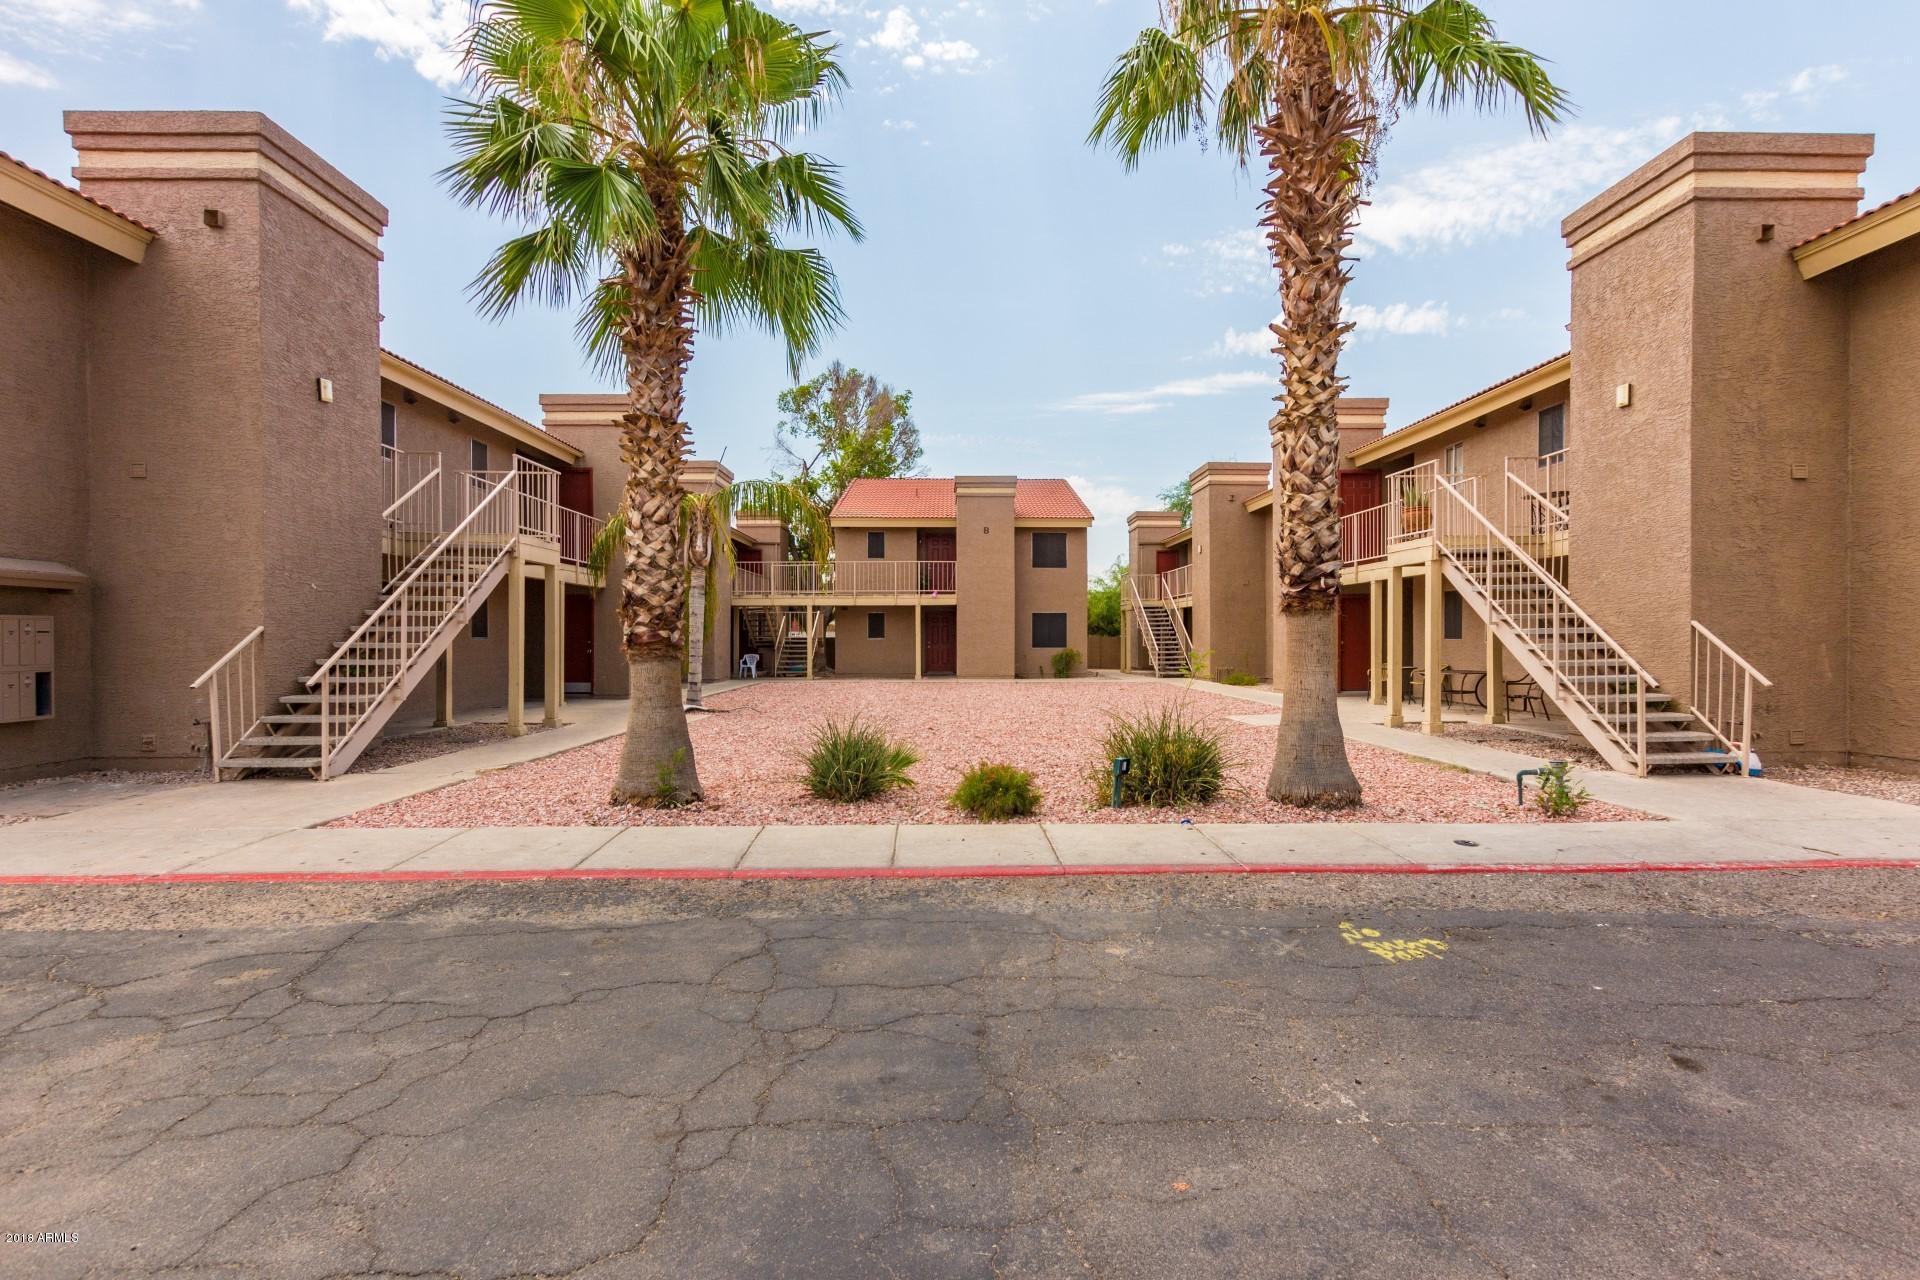 Photo of 5233 W Myrtle Avenue #208, Glendale, AZ 85301